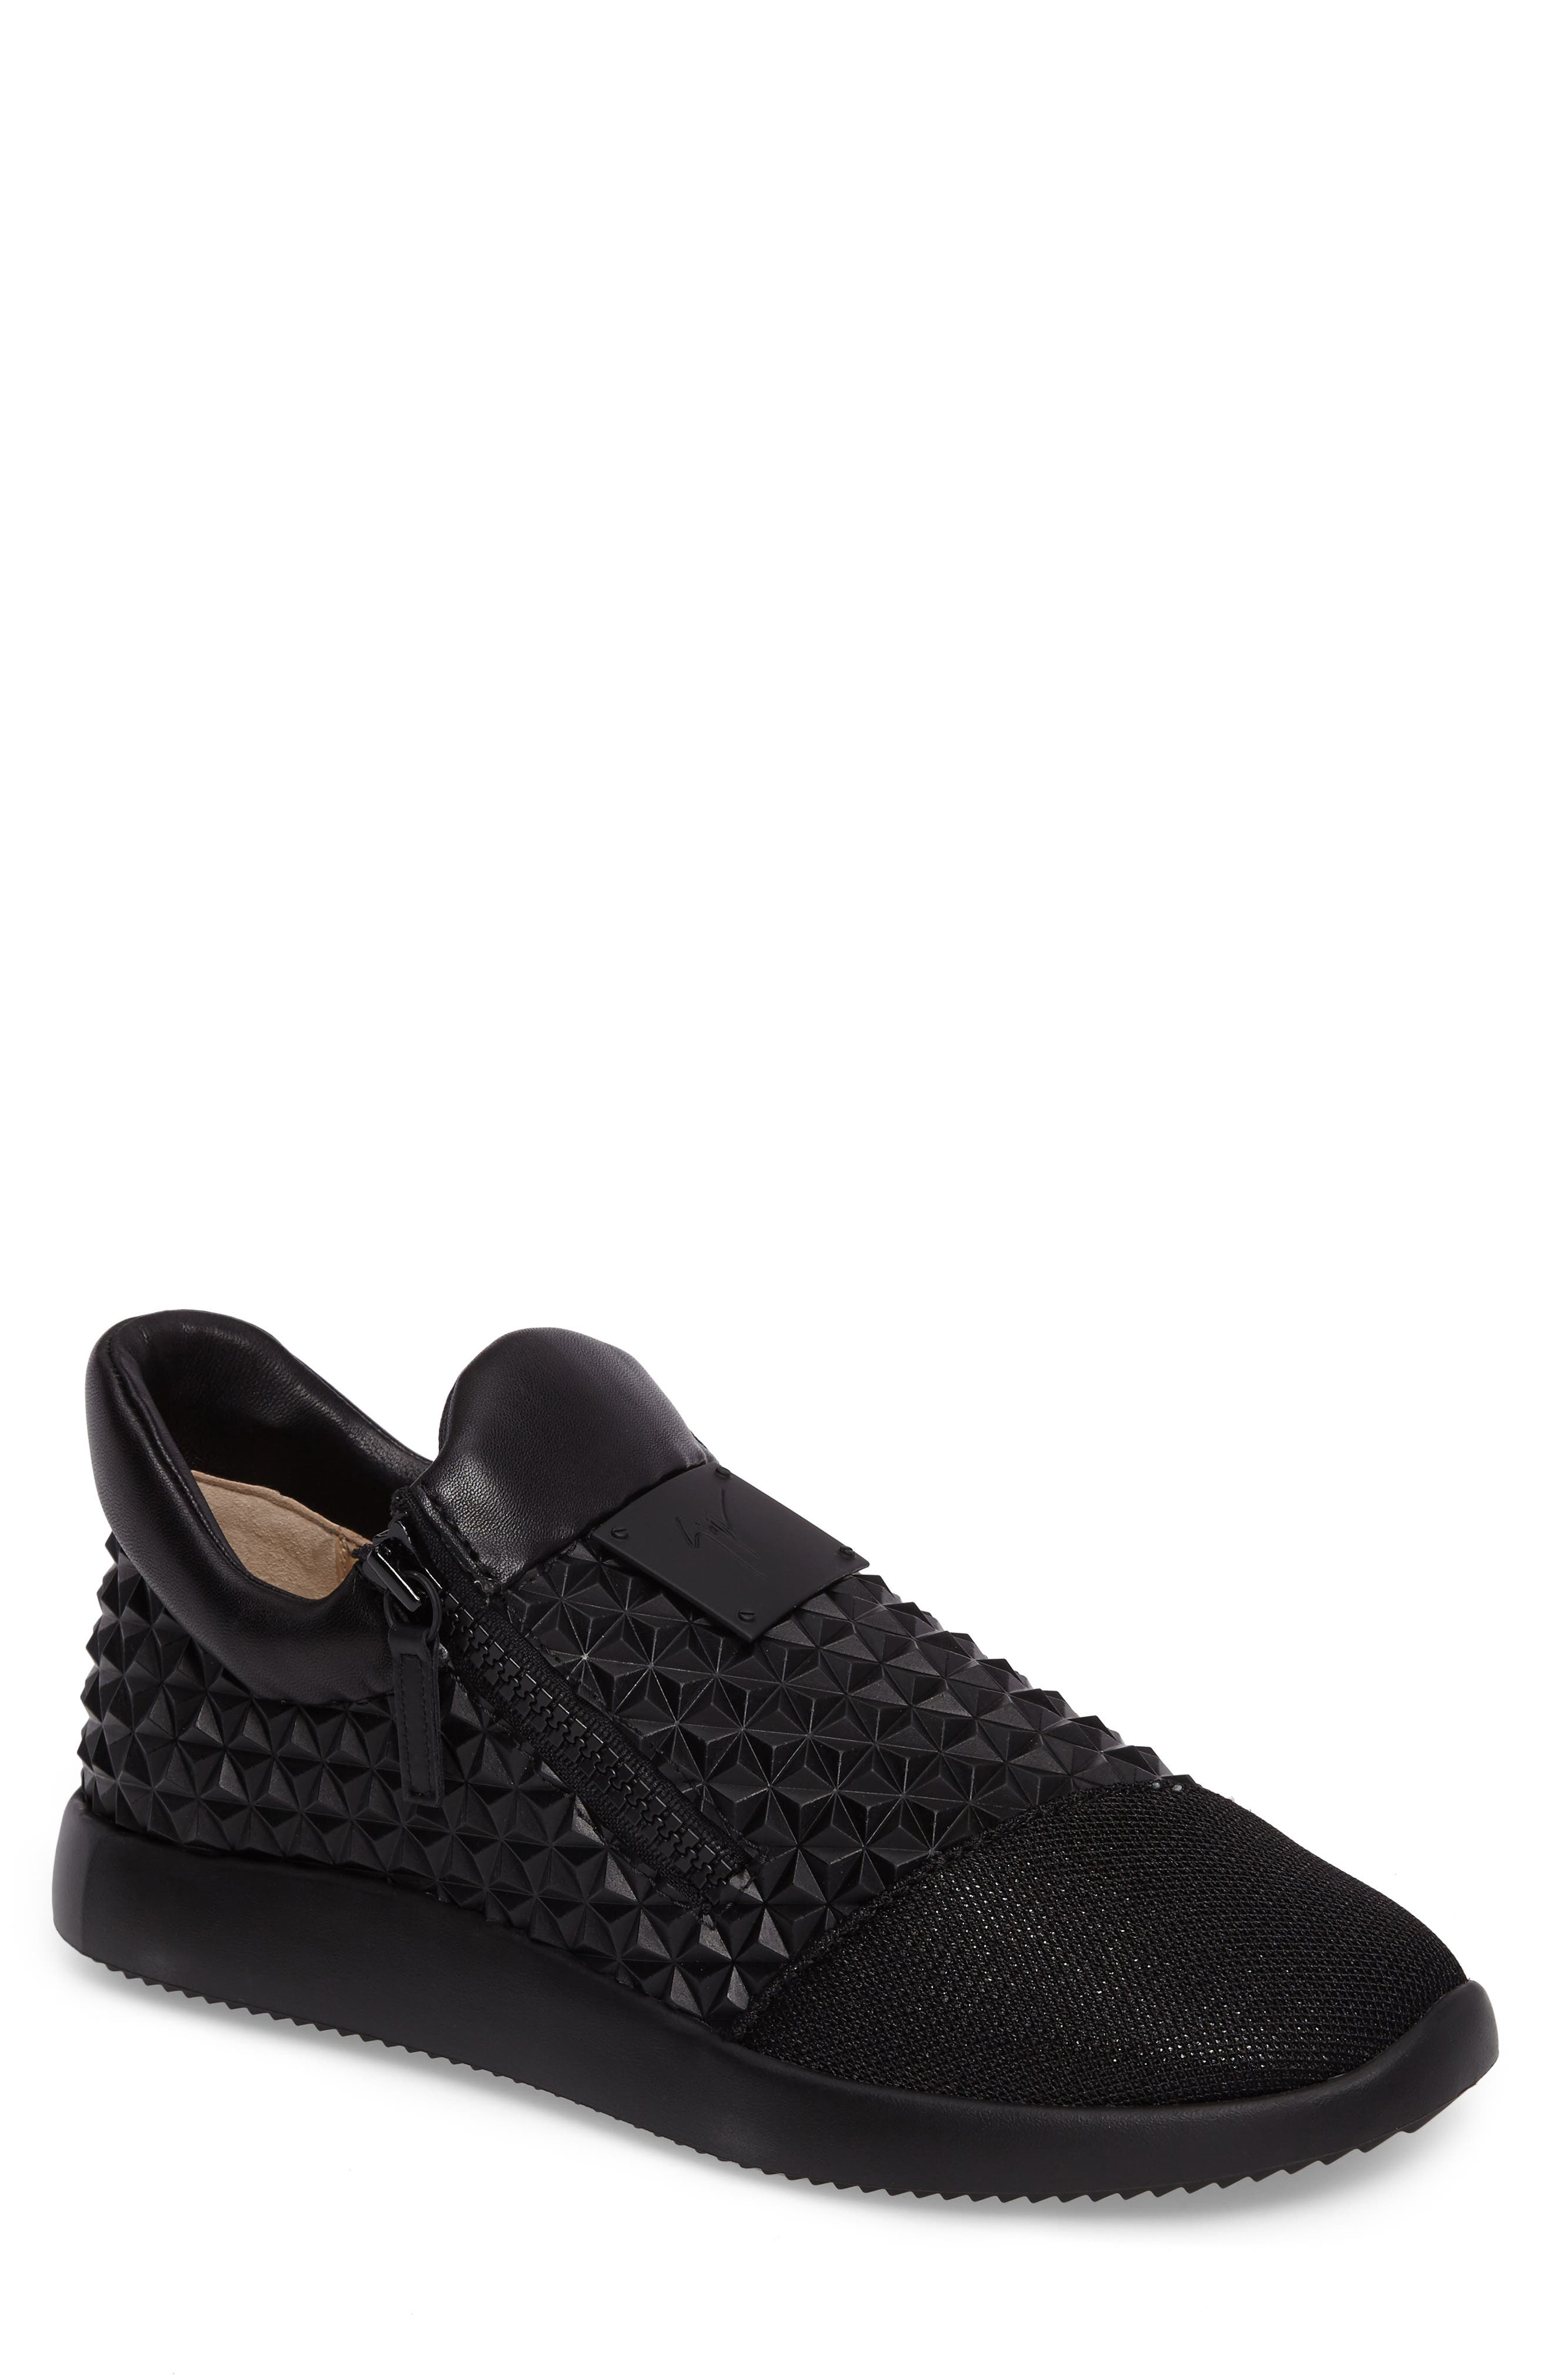 Main Image - Giuseppe Zanotti Geo Embossed Zip Sneaker (Men)